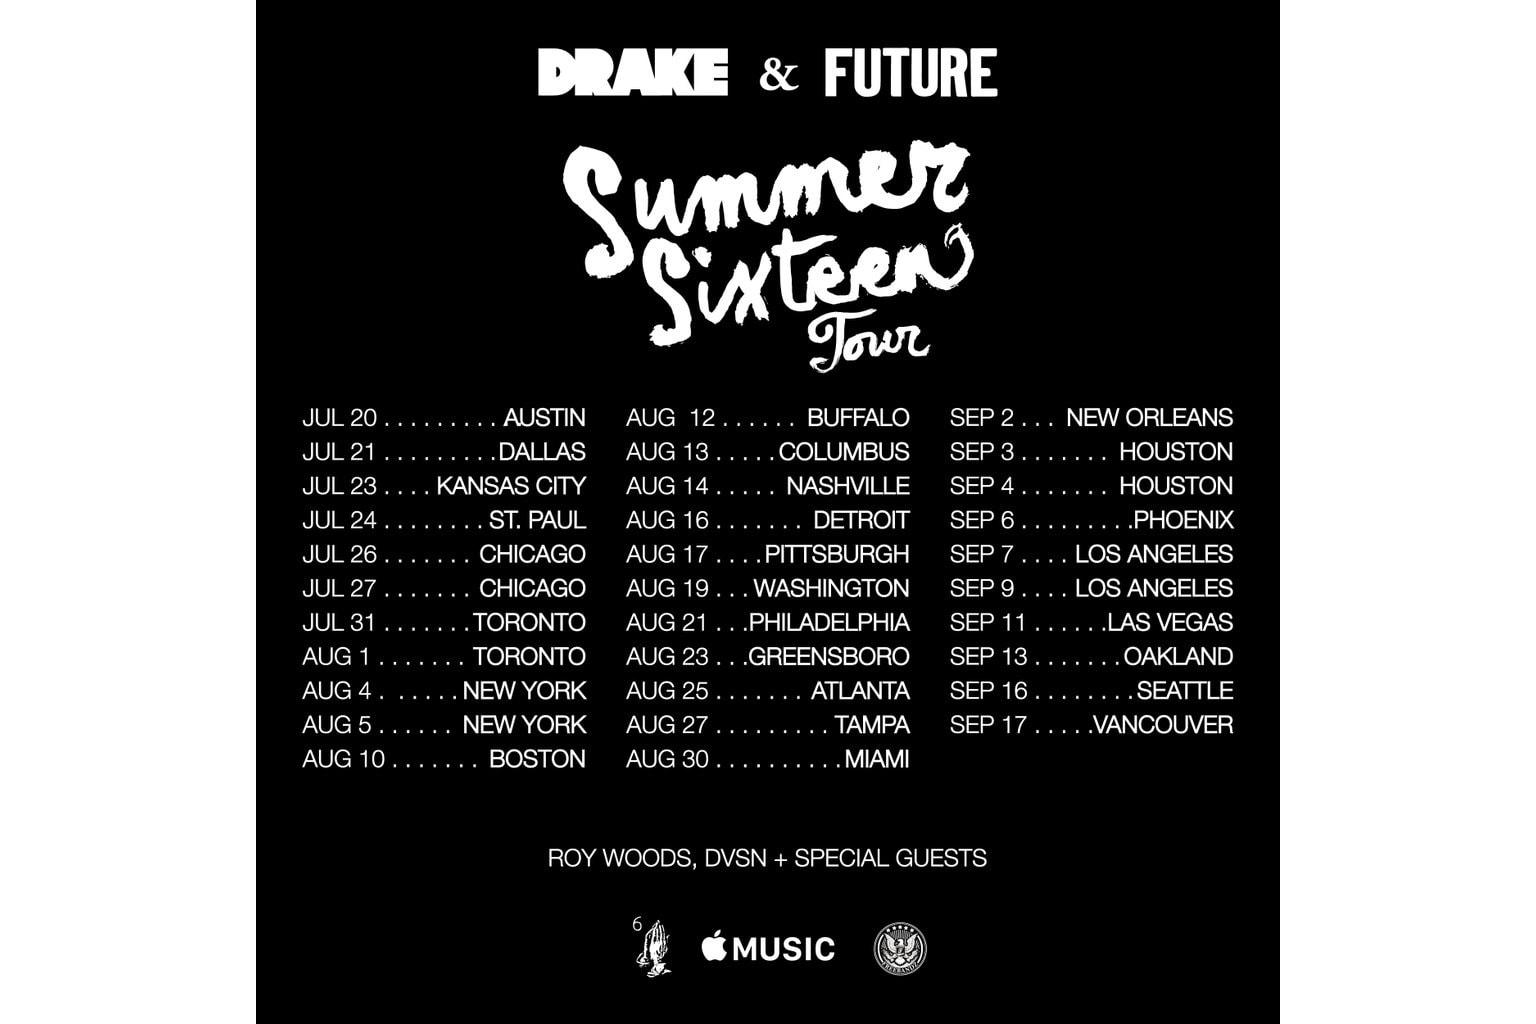 drake-future-summer-sixteen-tour-dates